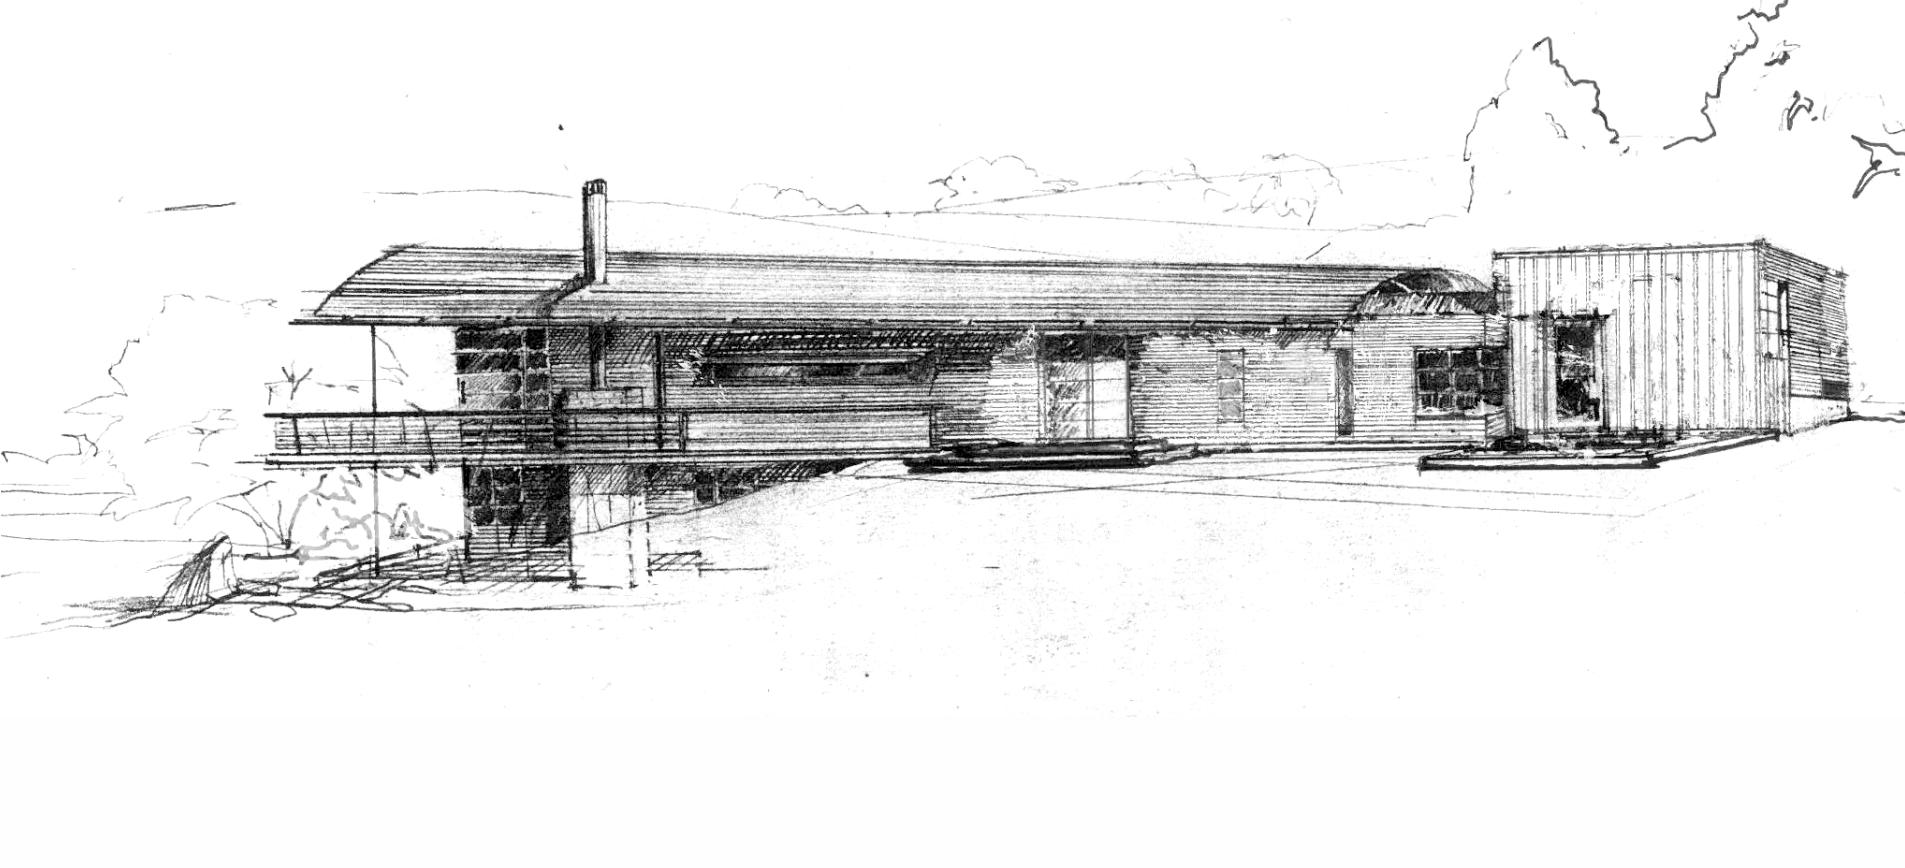 Hogan/Mayo House 3 Project, Del Mar, CA 1996 Designer: Fu-Tung Cheng